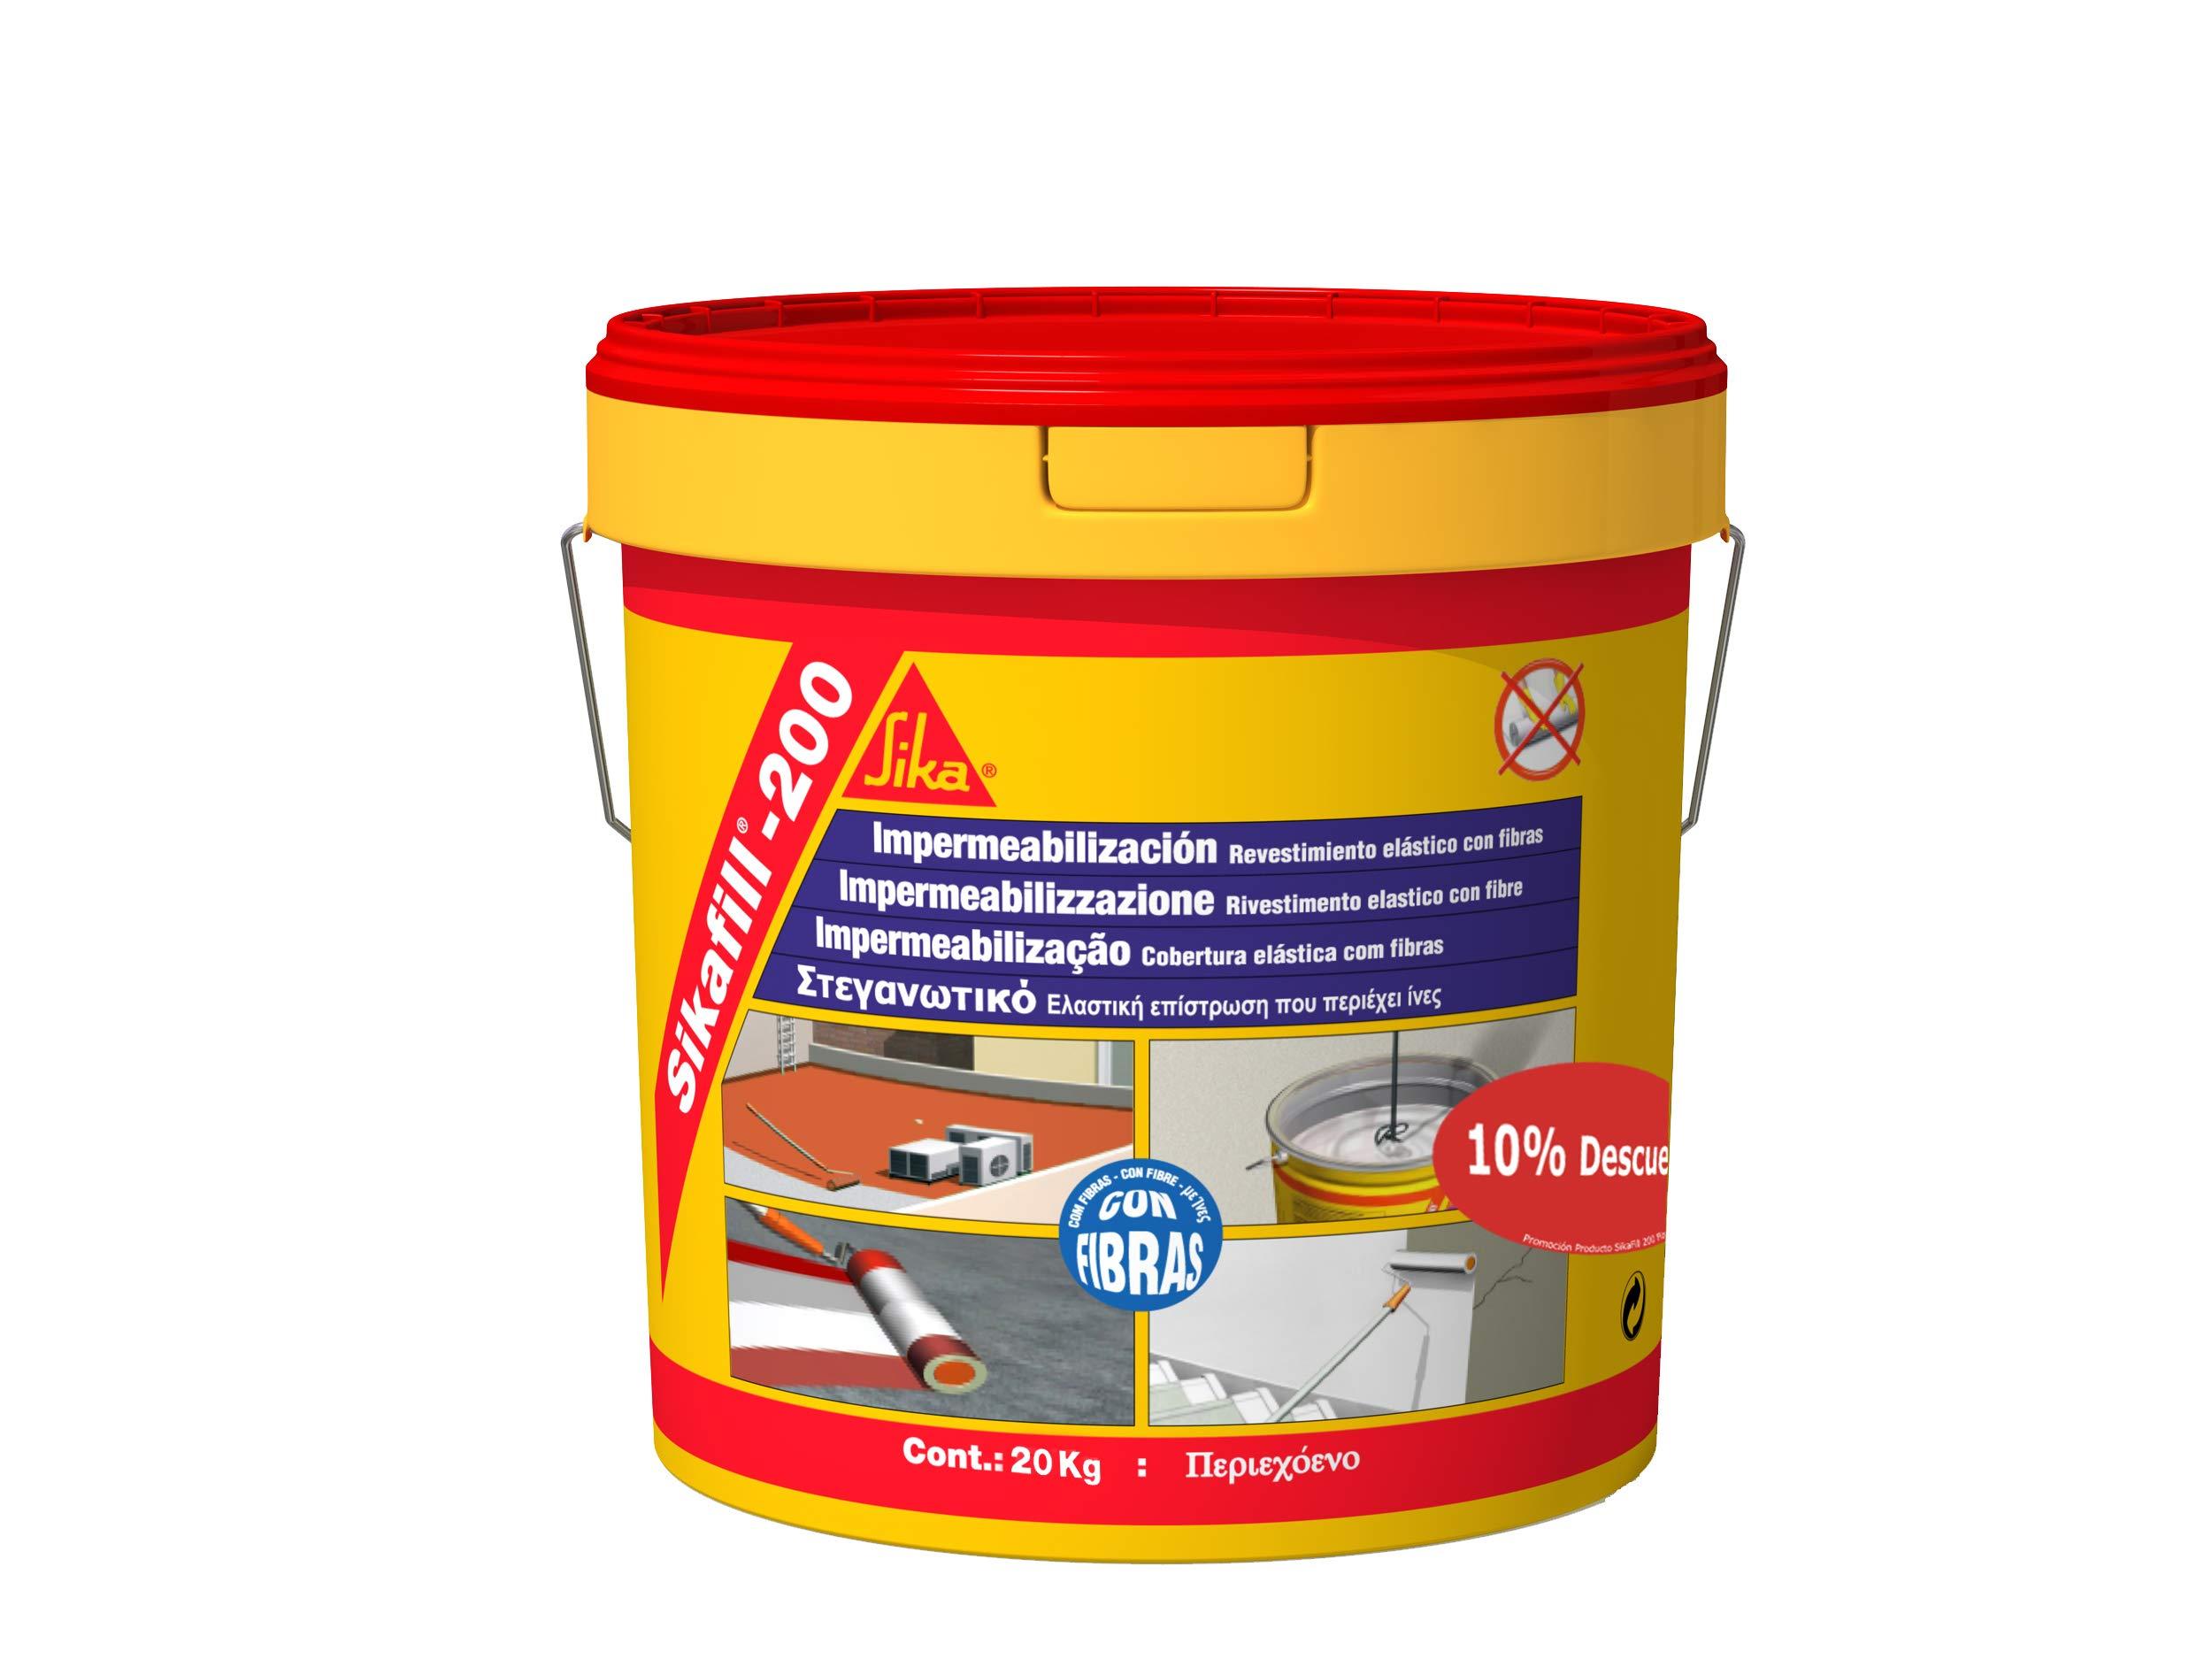 Sikafill-200 fibras, Pintura elástica con fibras para impermeabilización, Blanco, 20kg product